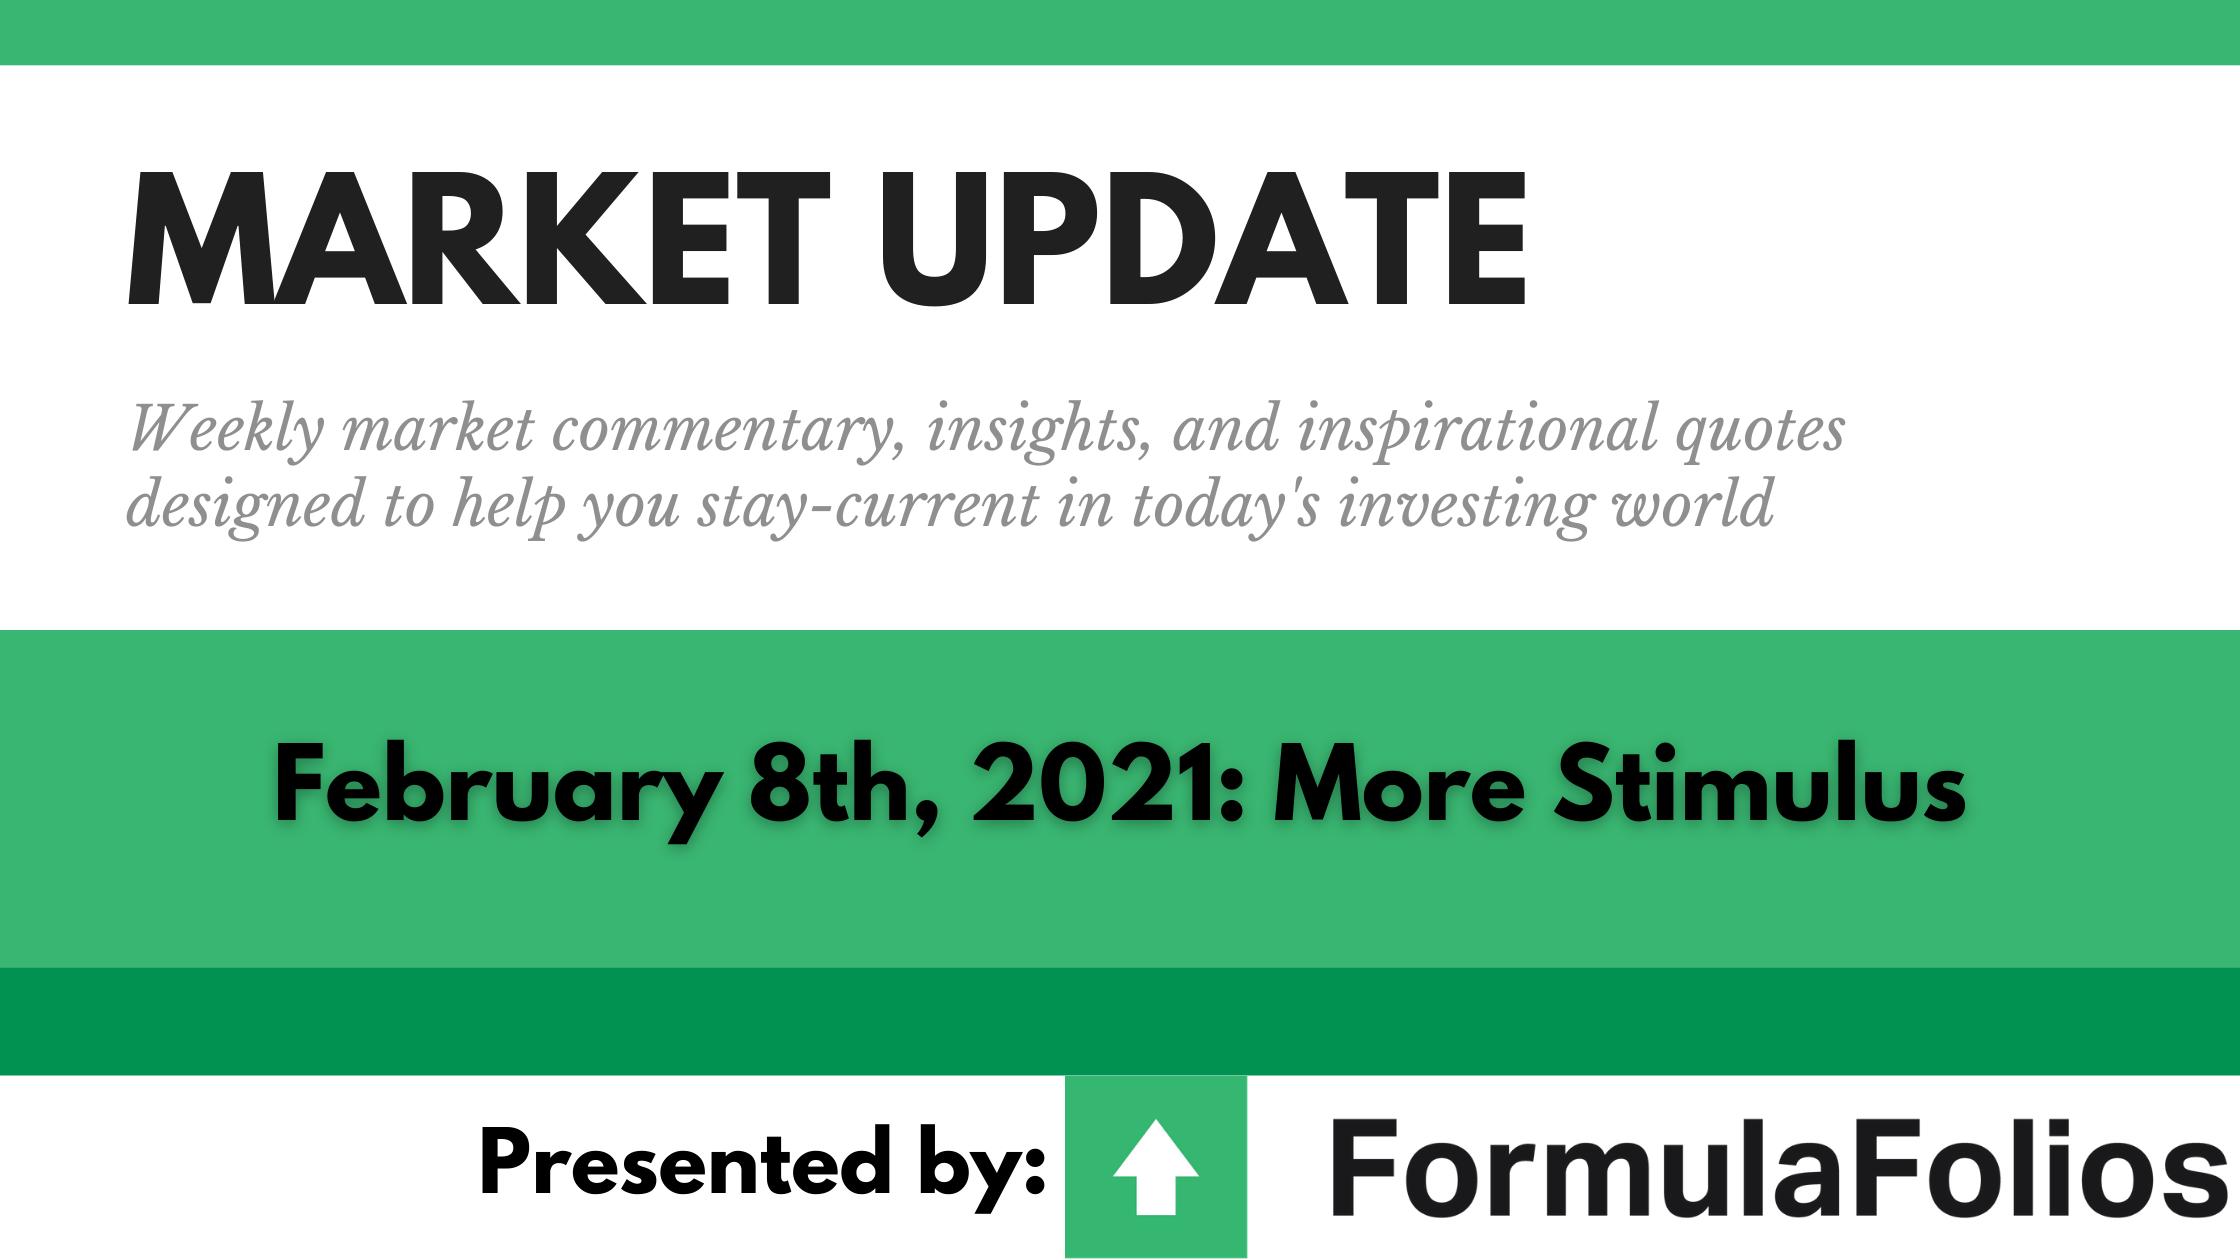 Market Update: More Stimulus